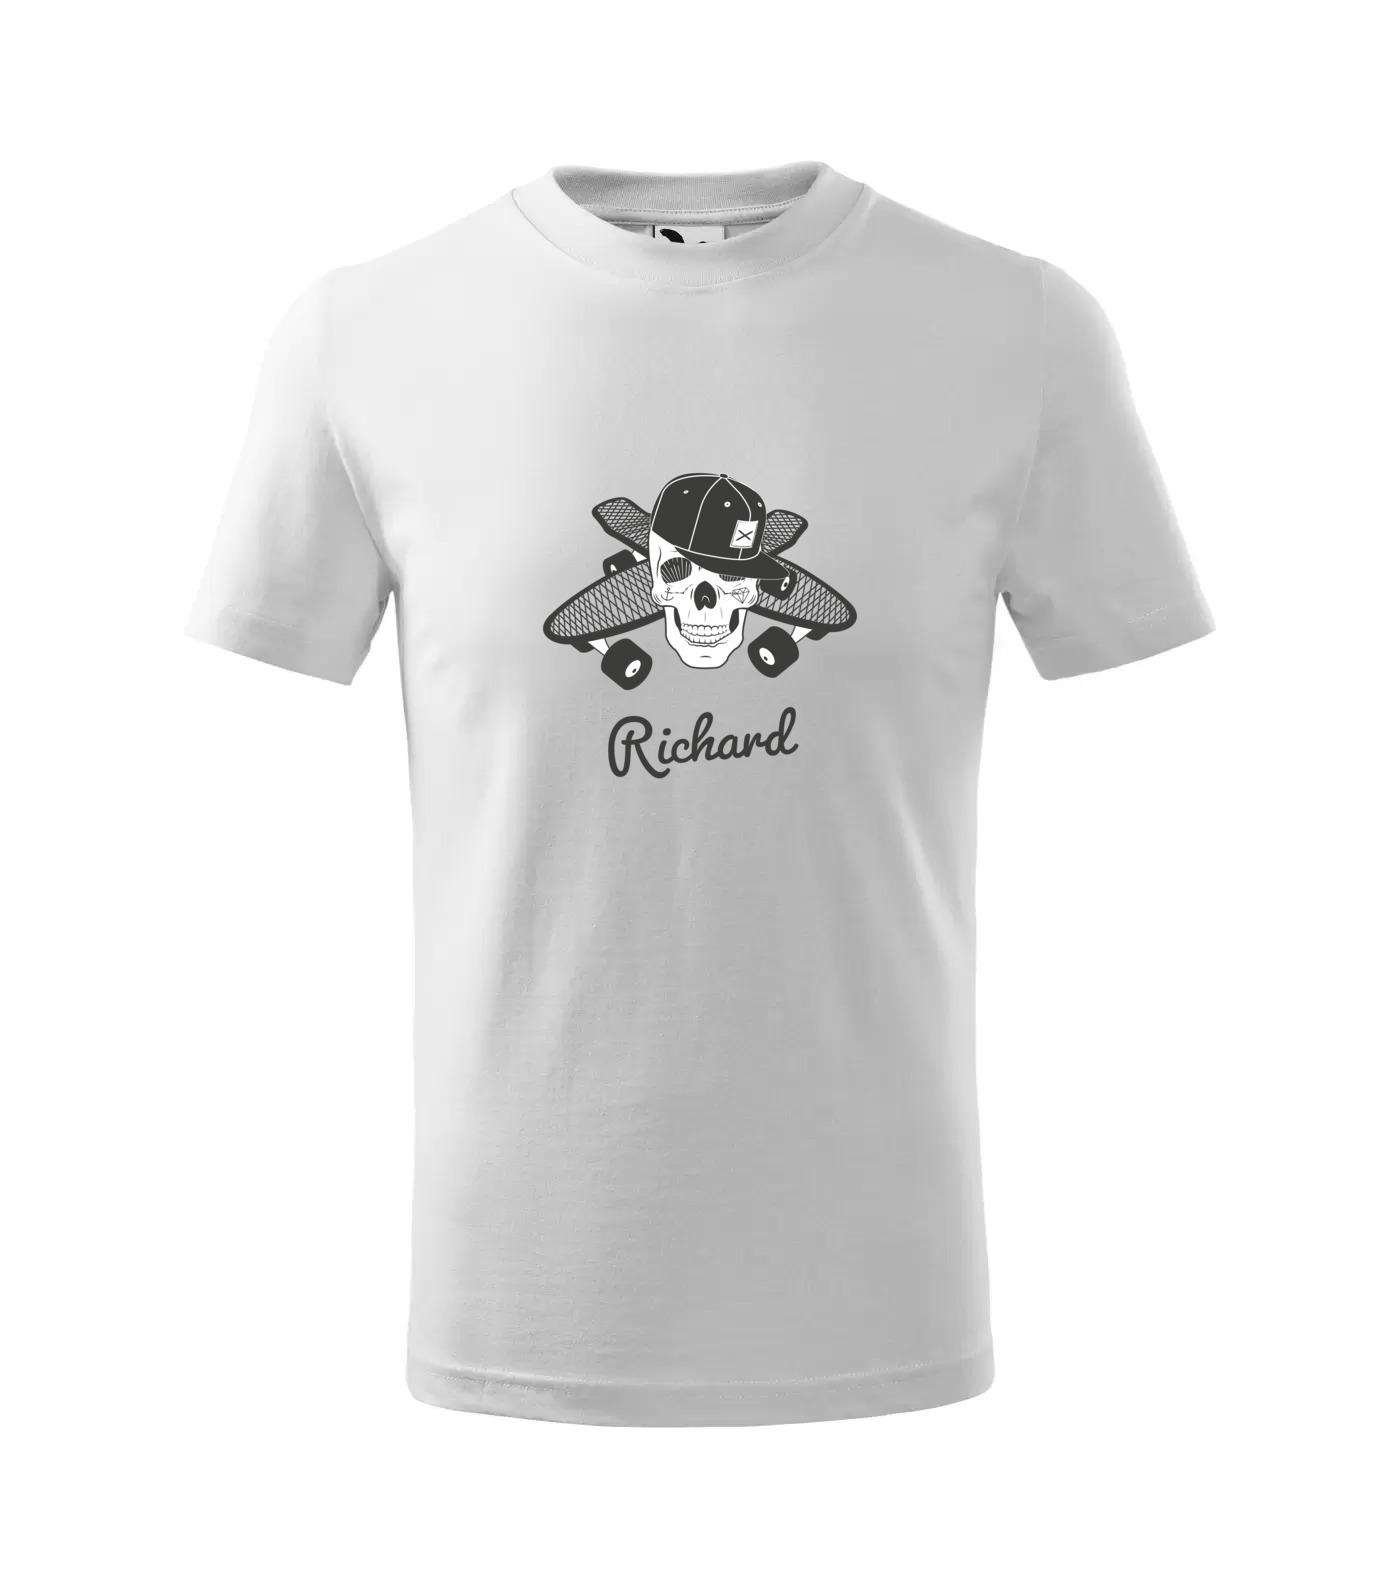 Tričko Skejťák Richard